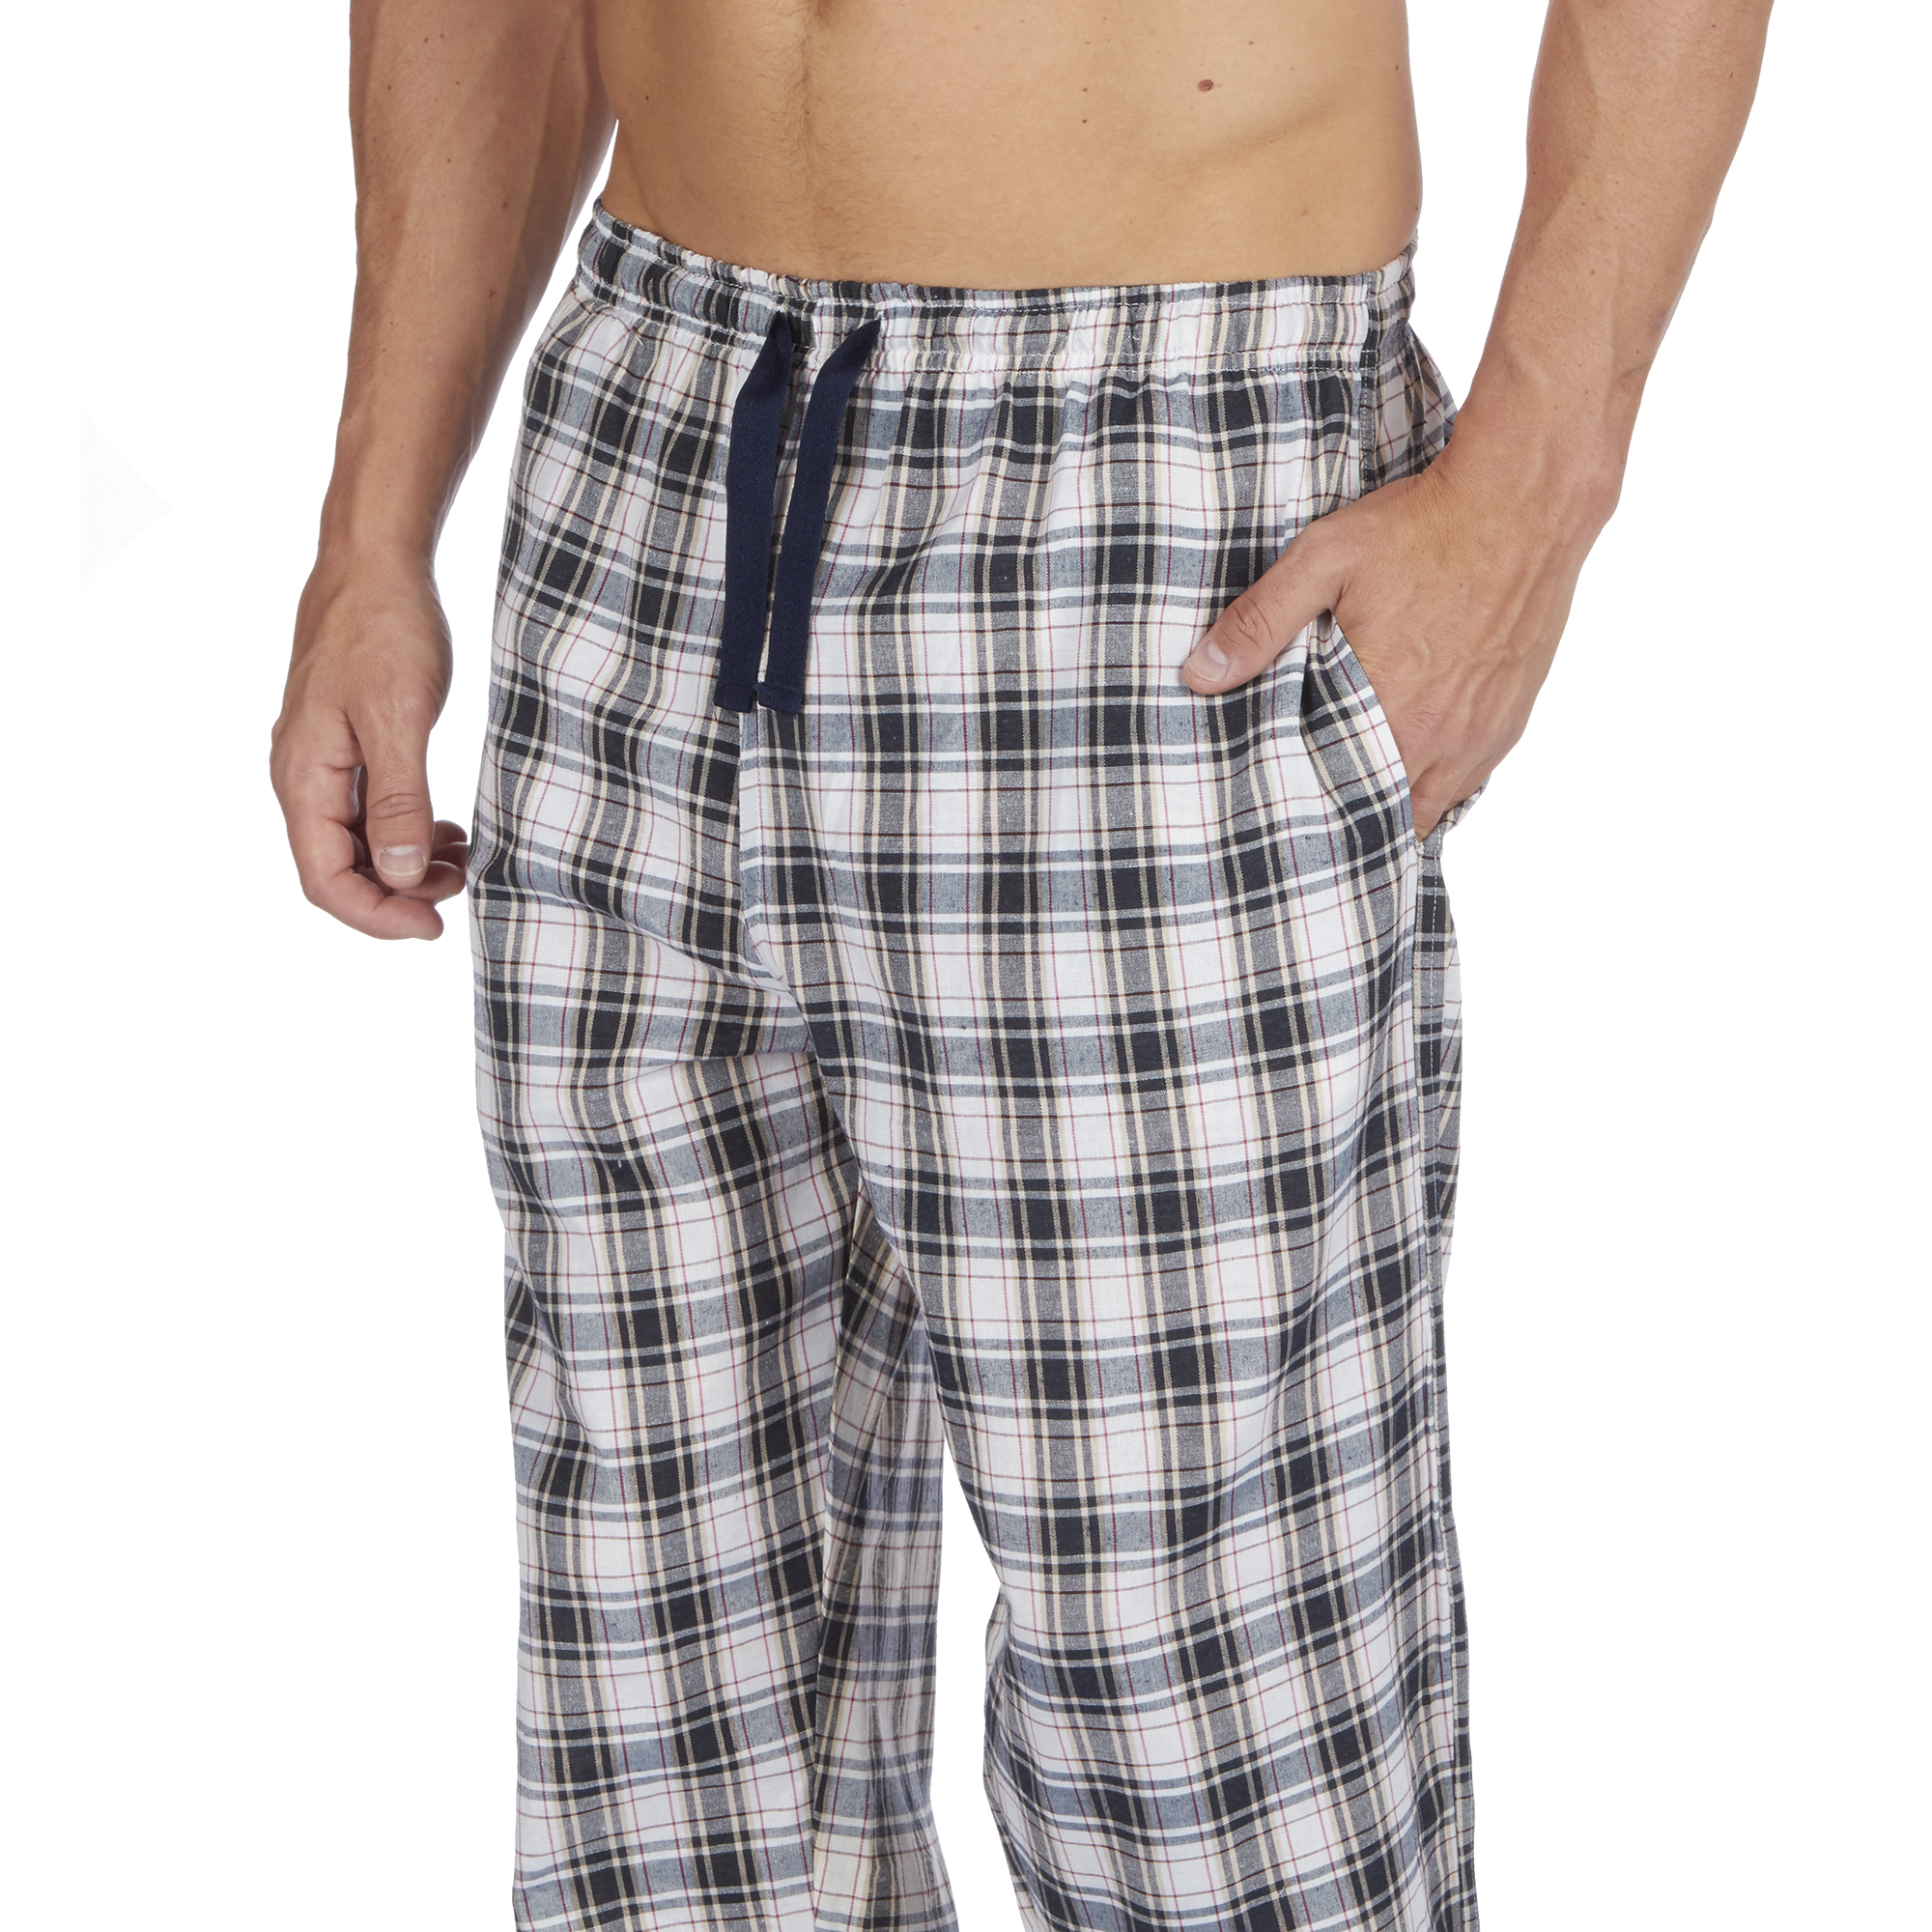 Jason-Jones-Homme-Carreaux-Tisse-Pyjama-Pantalon-en-Coton-Melange-Serge-PJ-Lounge-Pants miniature 8